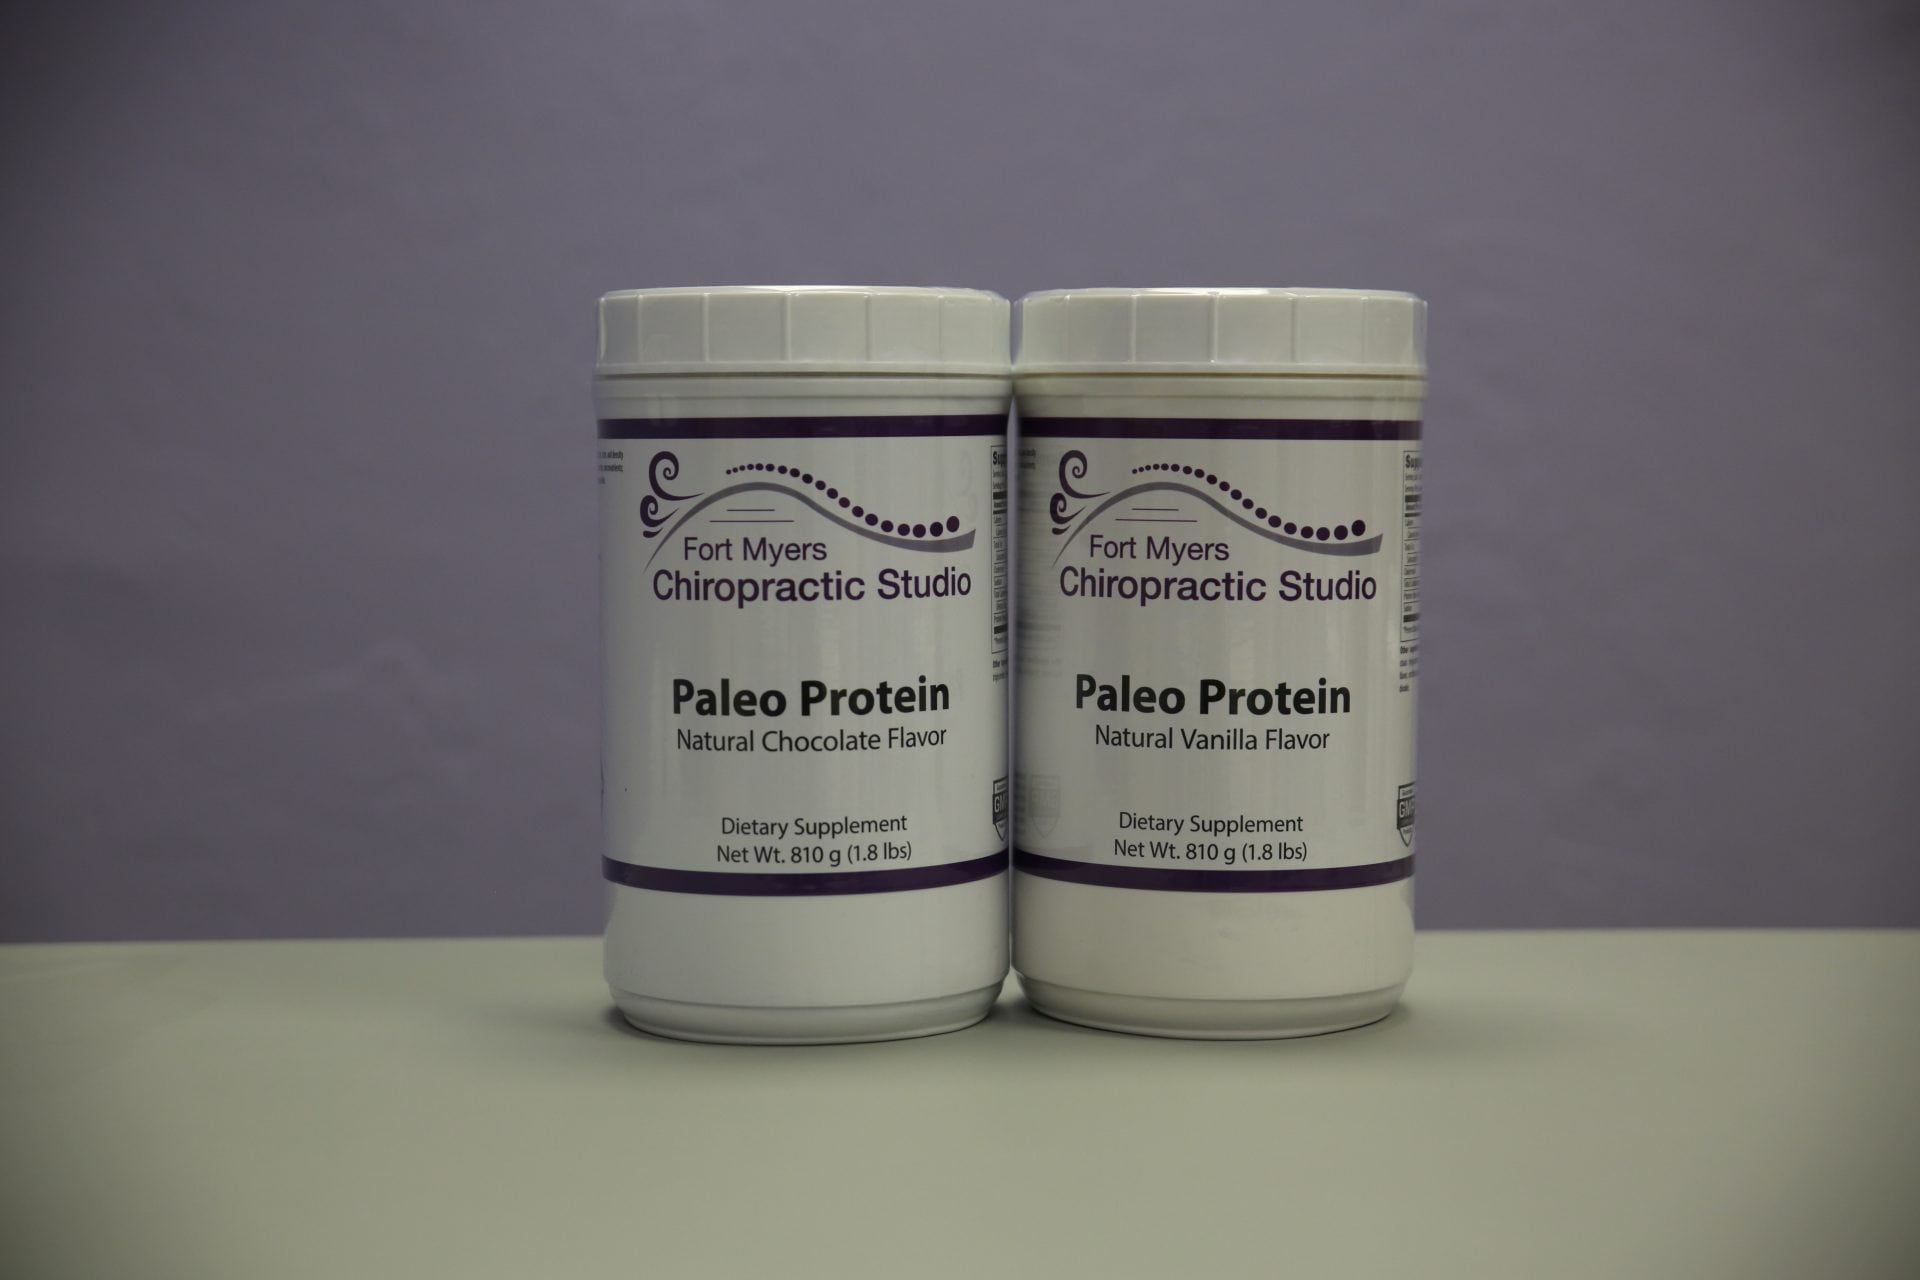 Paleo Protein Dietary Supplements